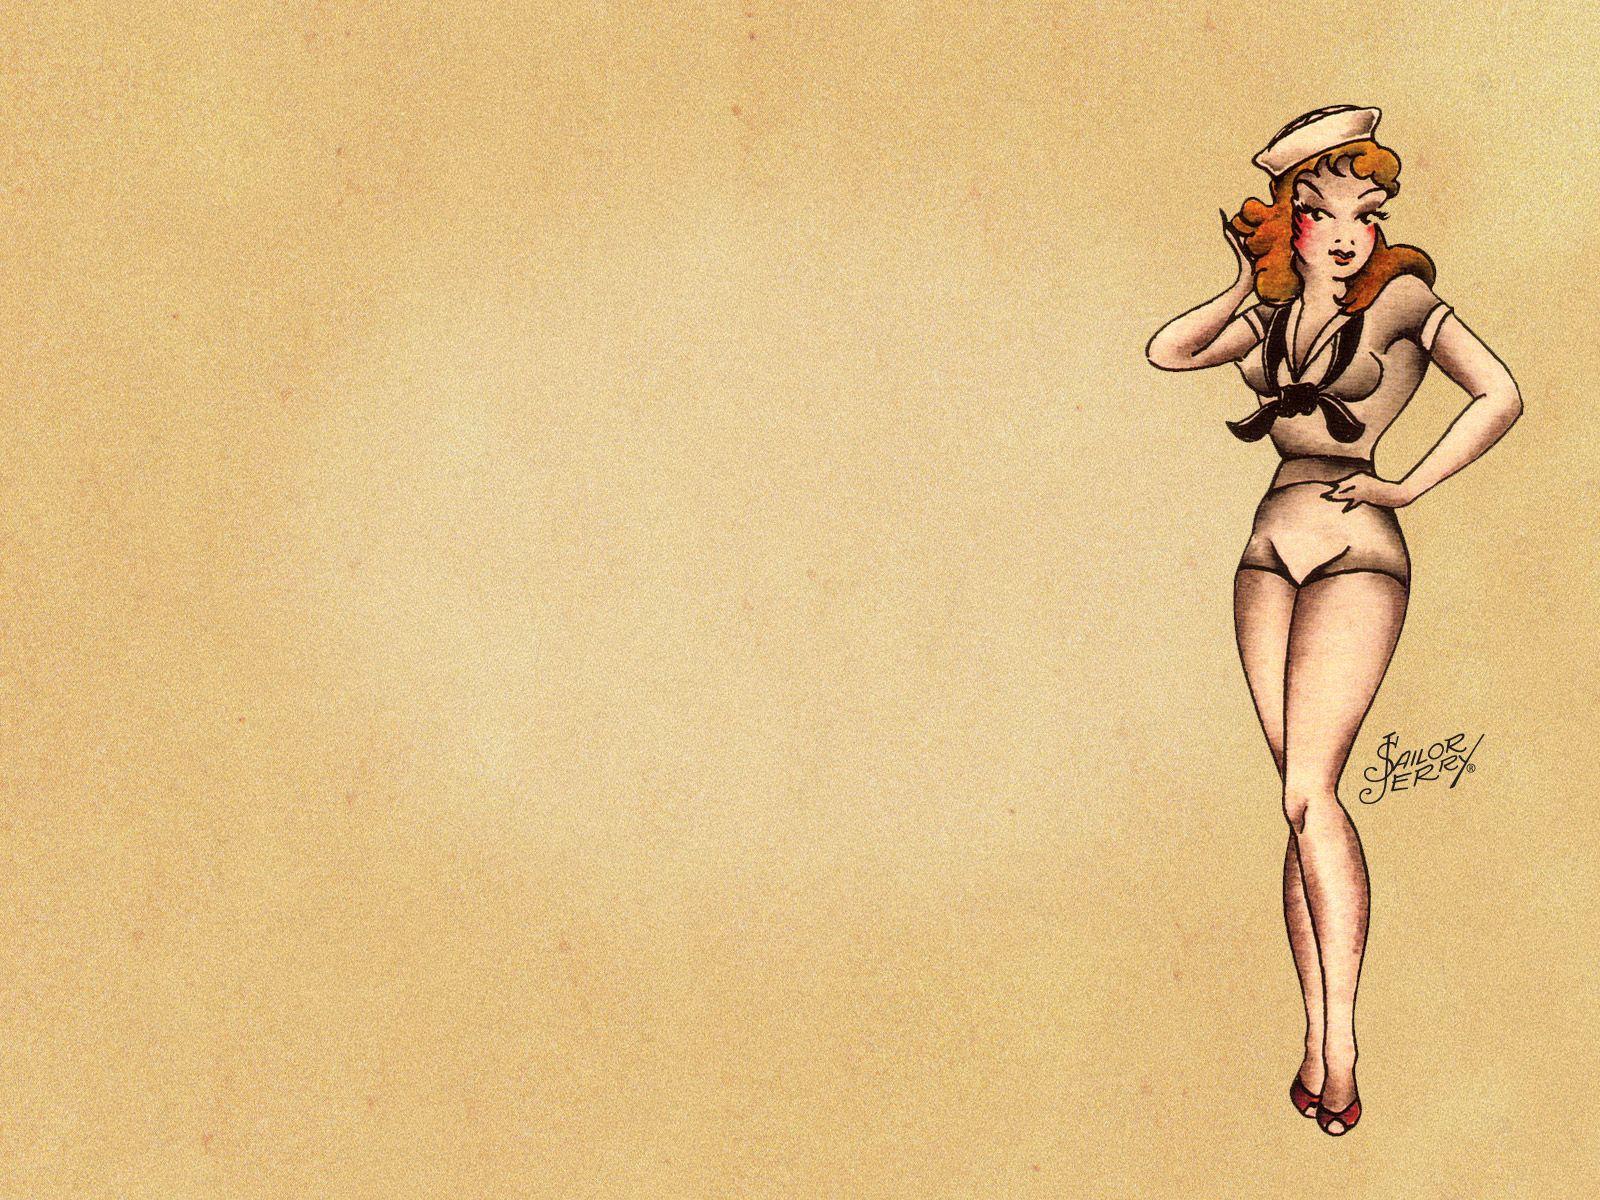 83 best SAILOR JERRY images on Pinterest | Sailor jerry tattoos ...